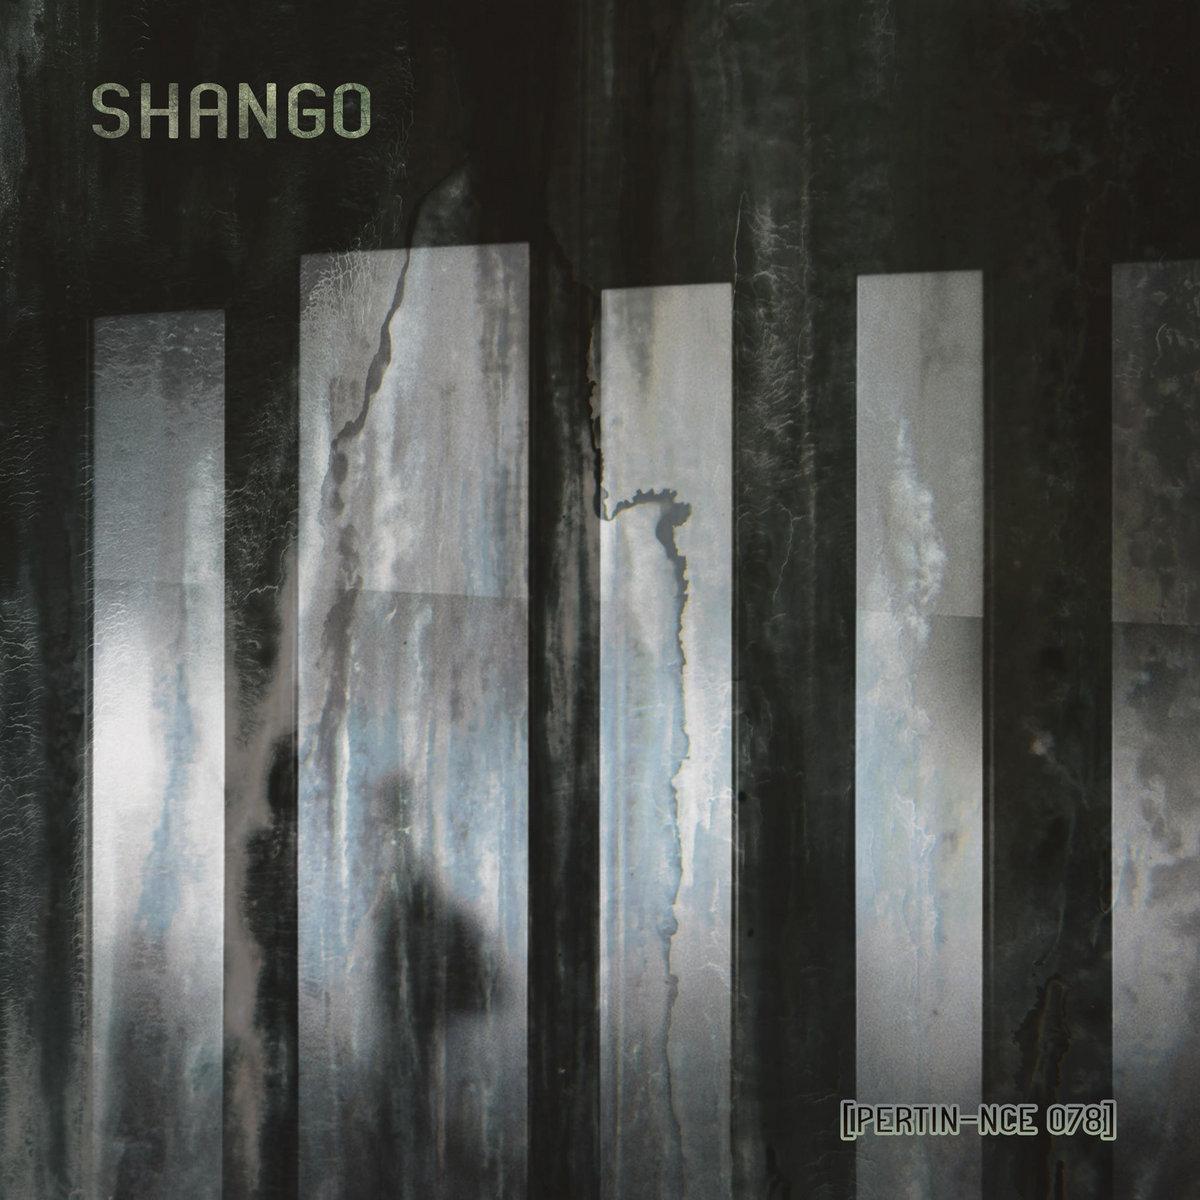 pertin-nce 078] Shango - Pertin-nce 078   Shango   pertin-nce